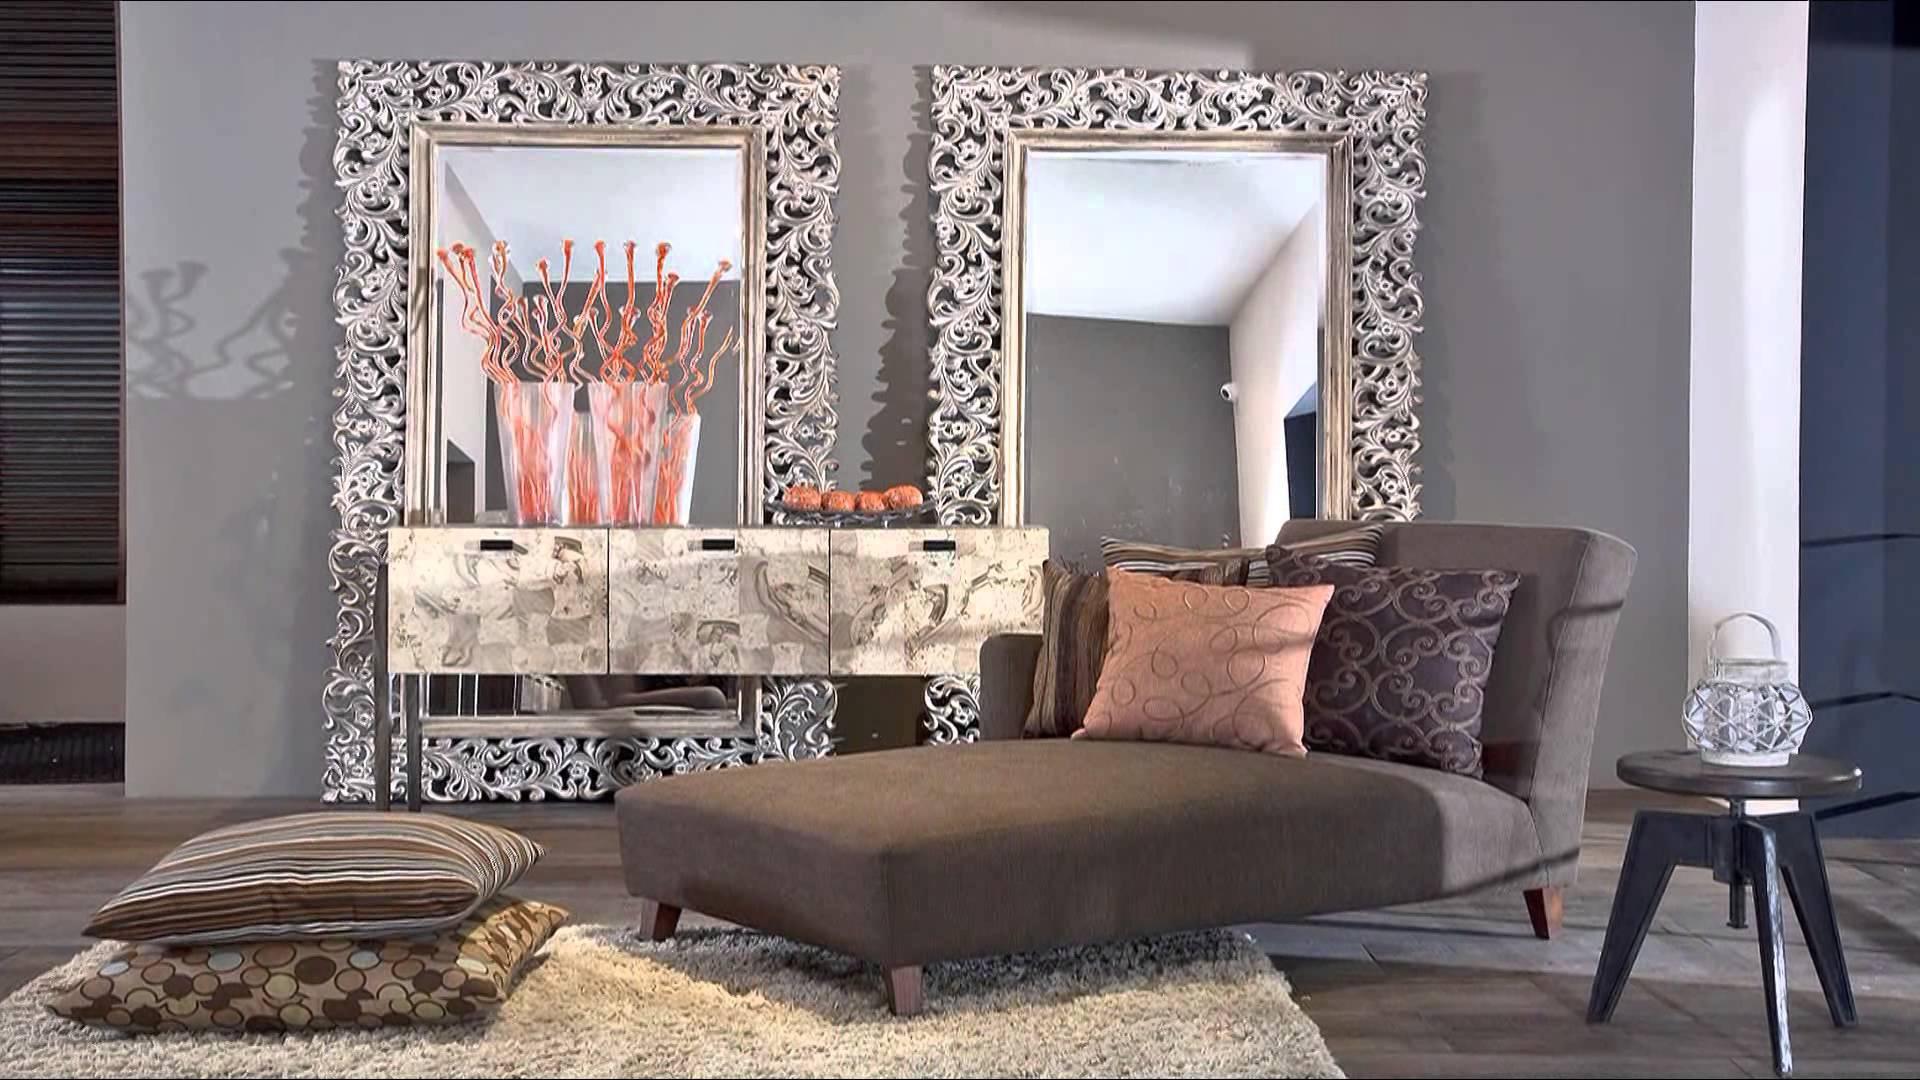 Комната с большими зеркалами